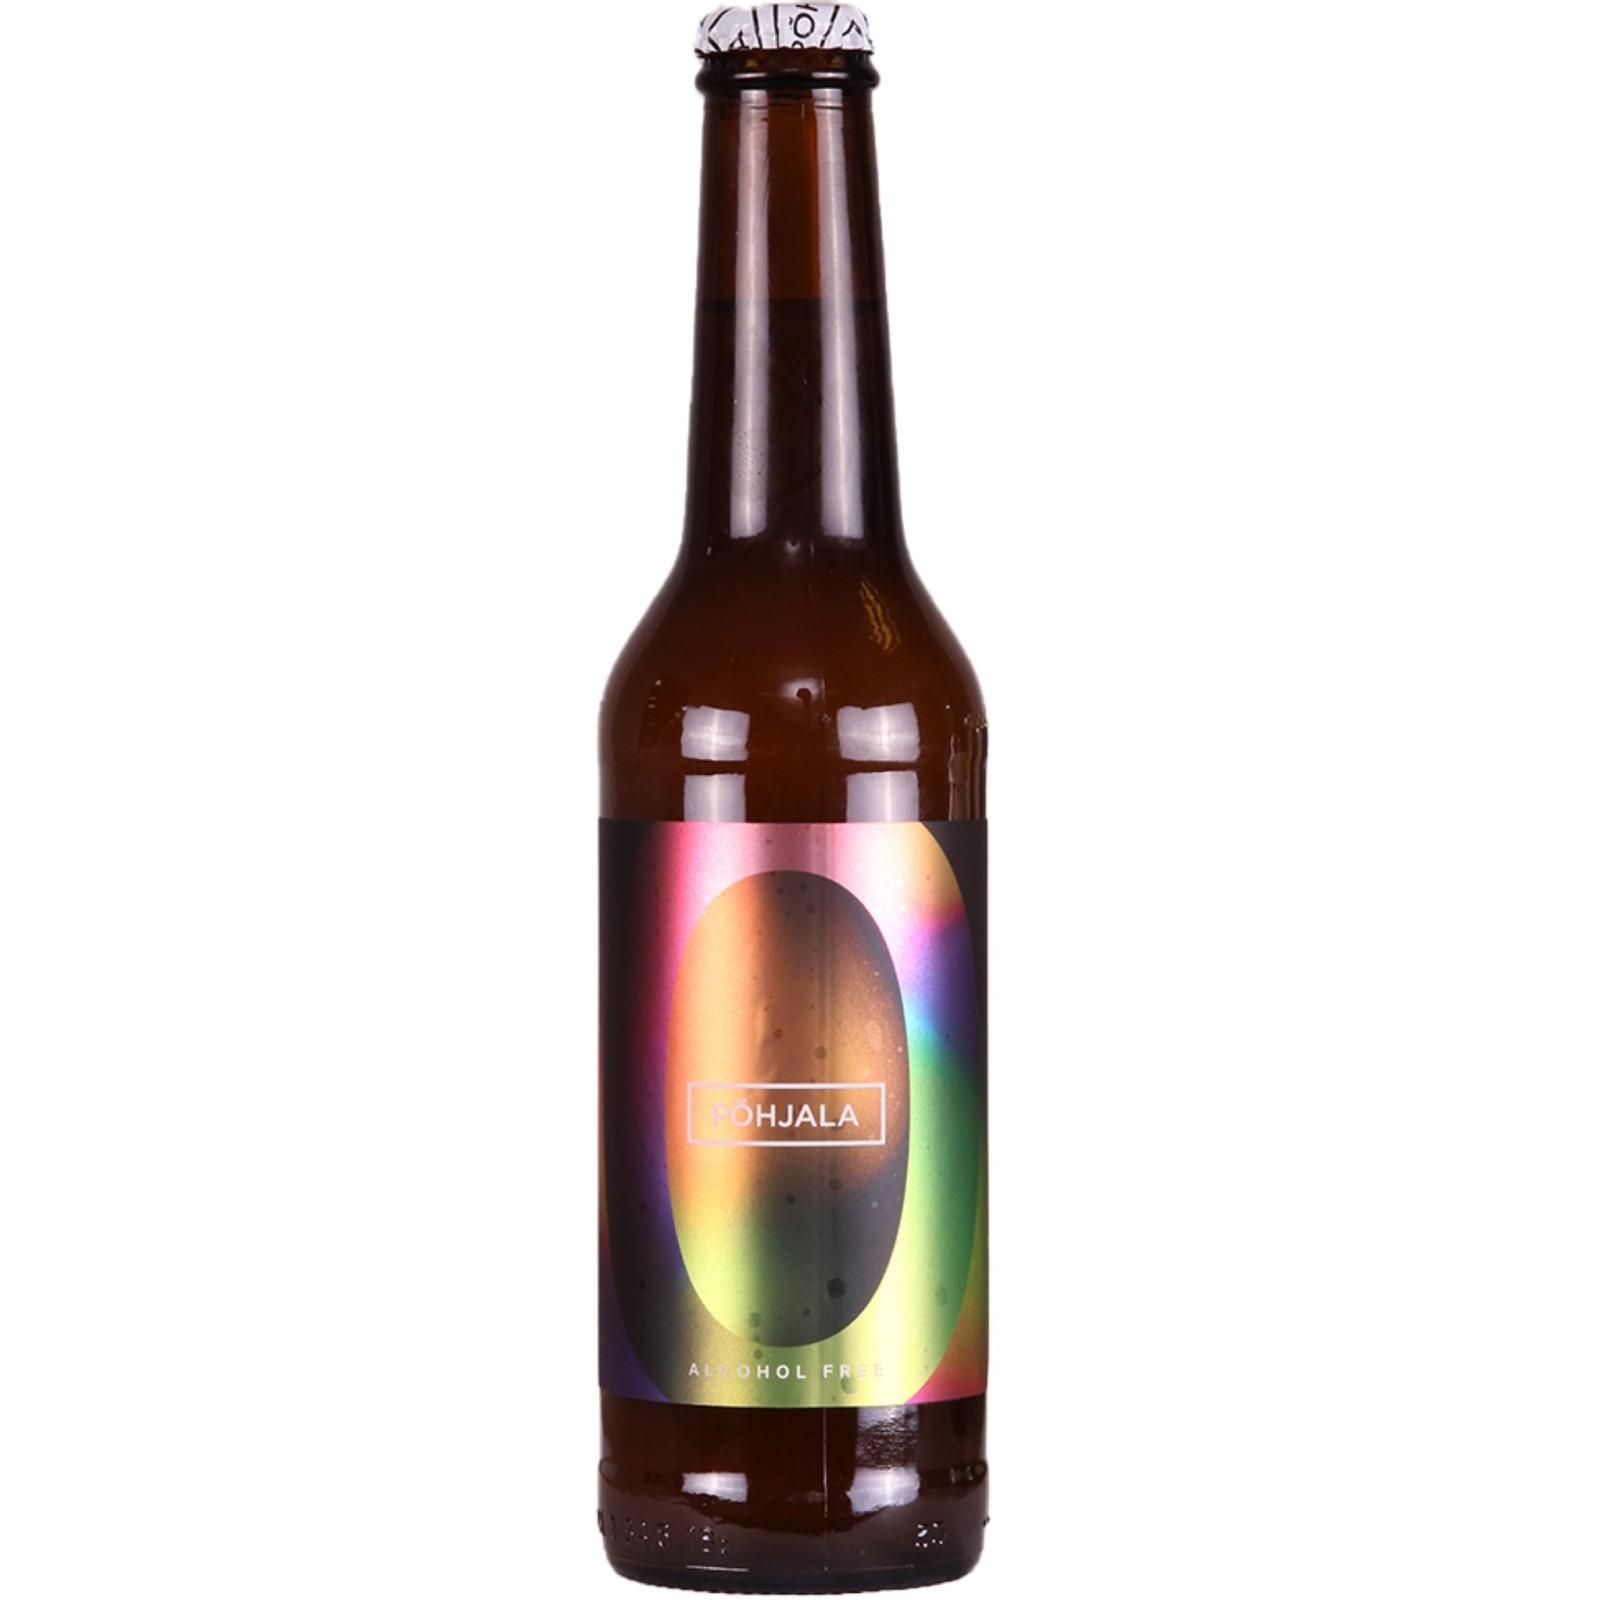 Tundra - Alcohol Free IPA 0.5% 330ml Pohjala Brewery